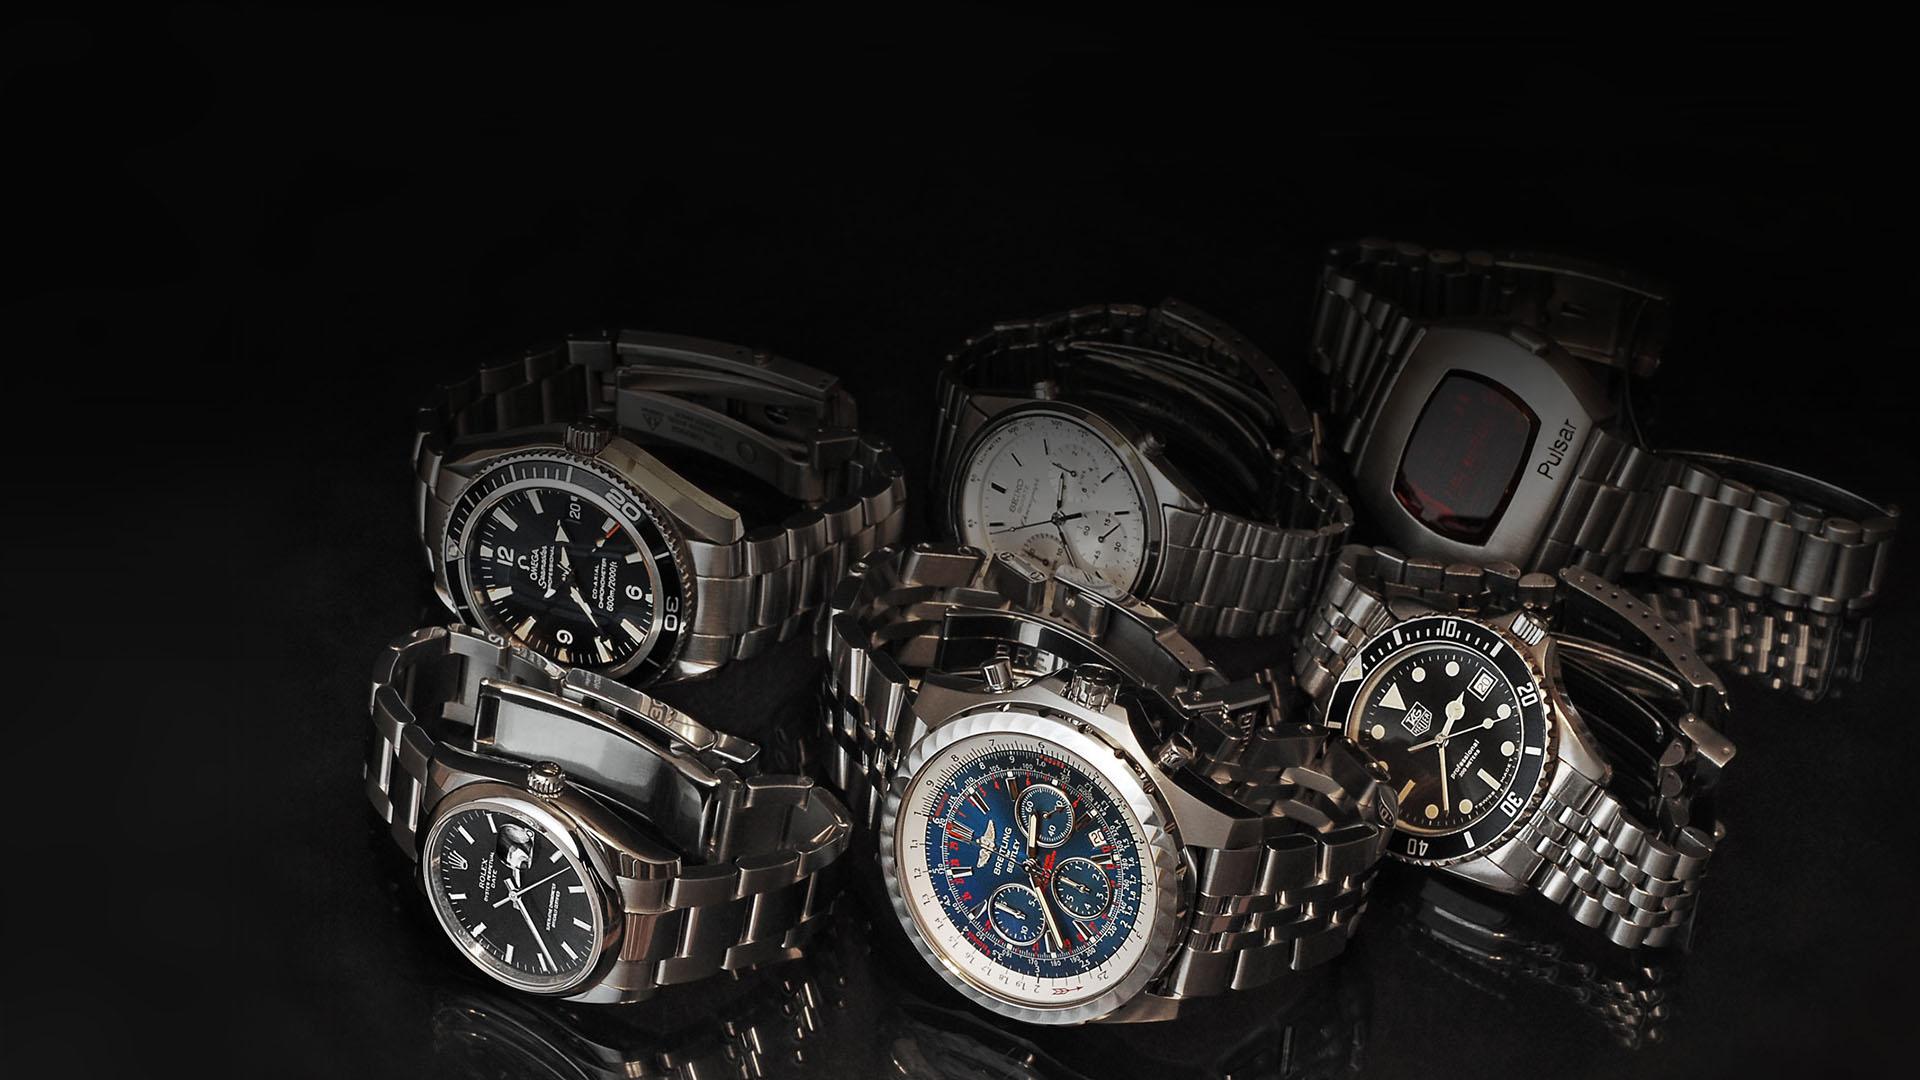 Watch Repair Shops Make Vintage Watch Investment Easier